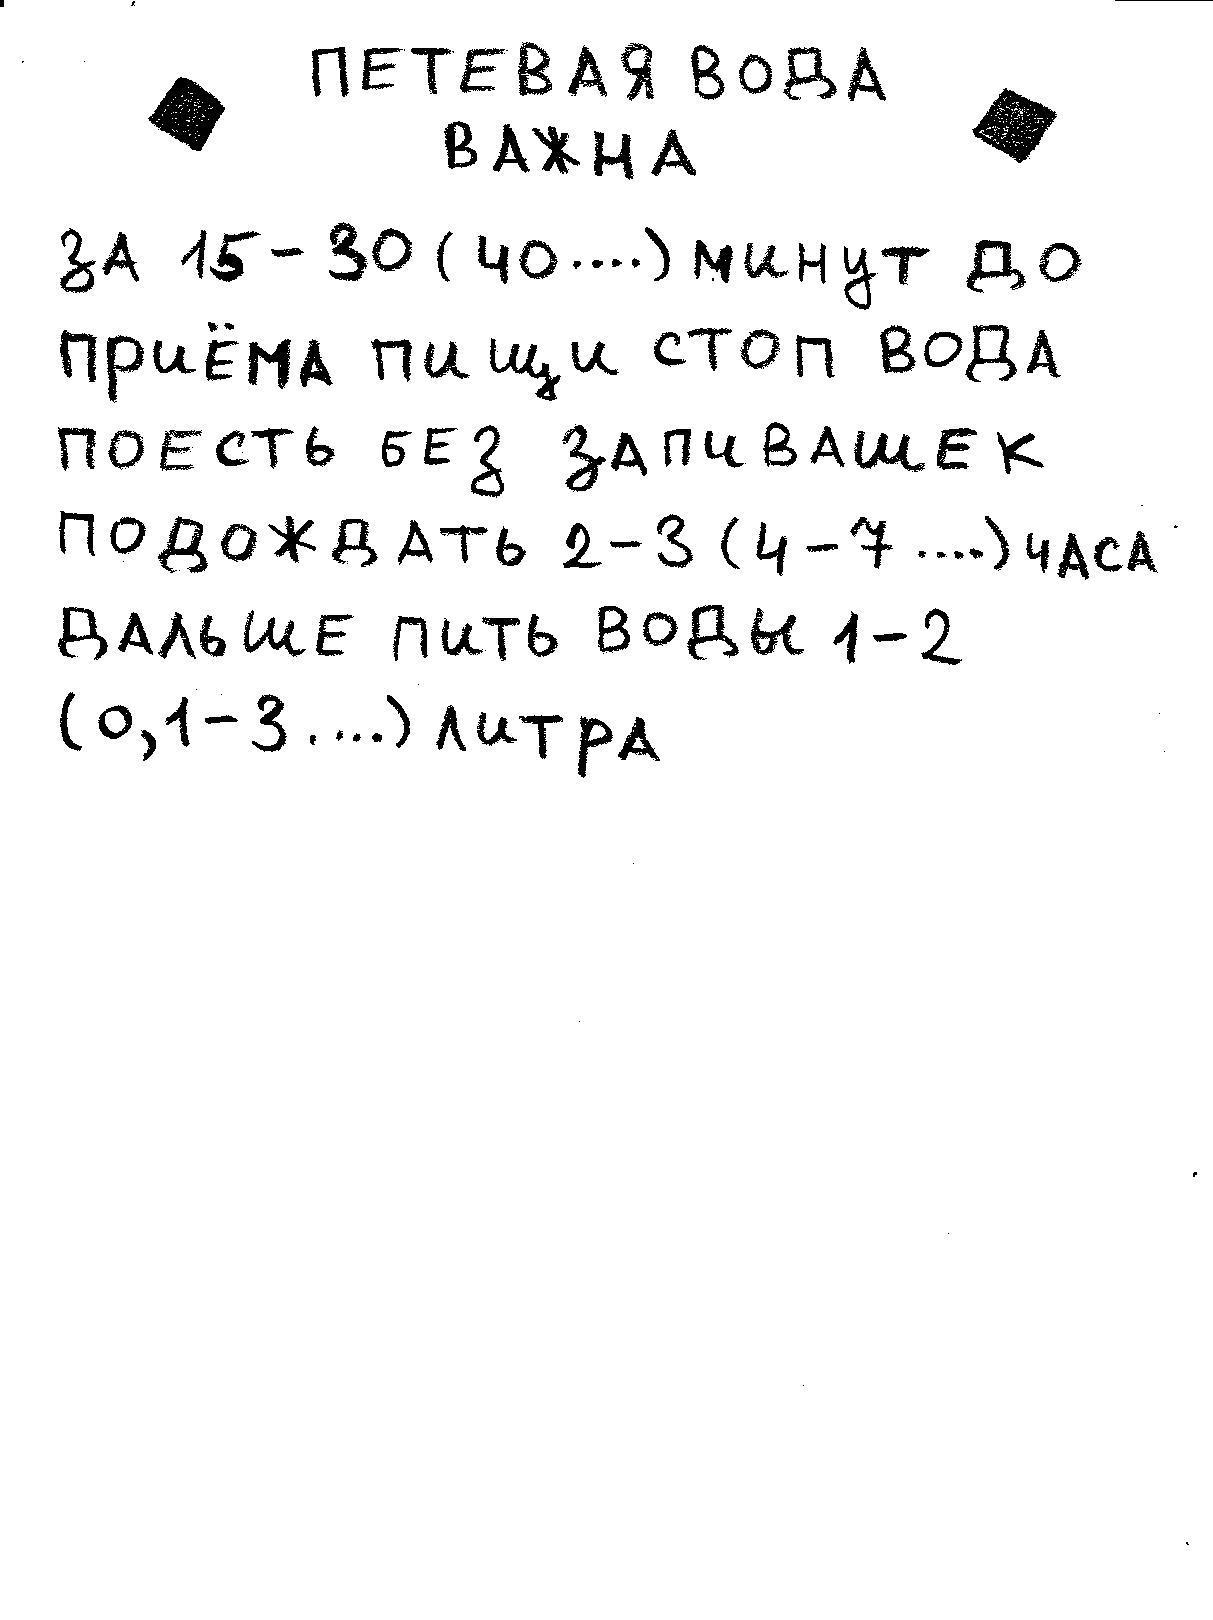 https://forumupload.ru/uploads/0000/35/39/247867/413307.jpg